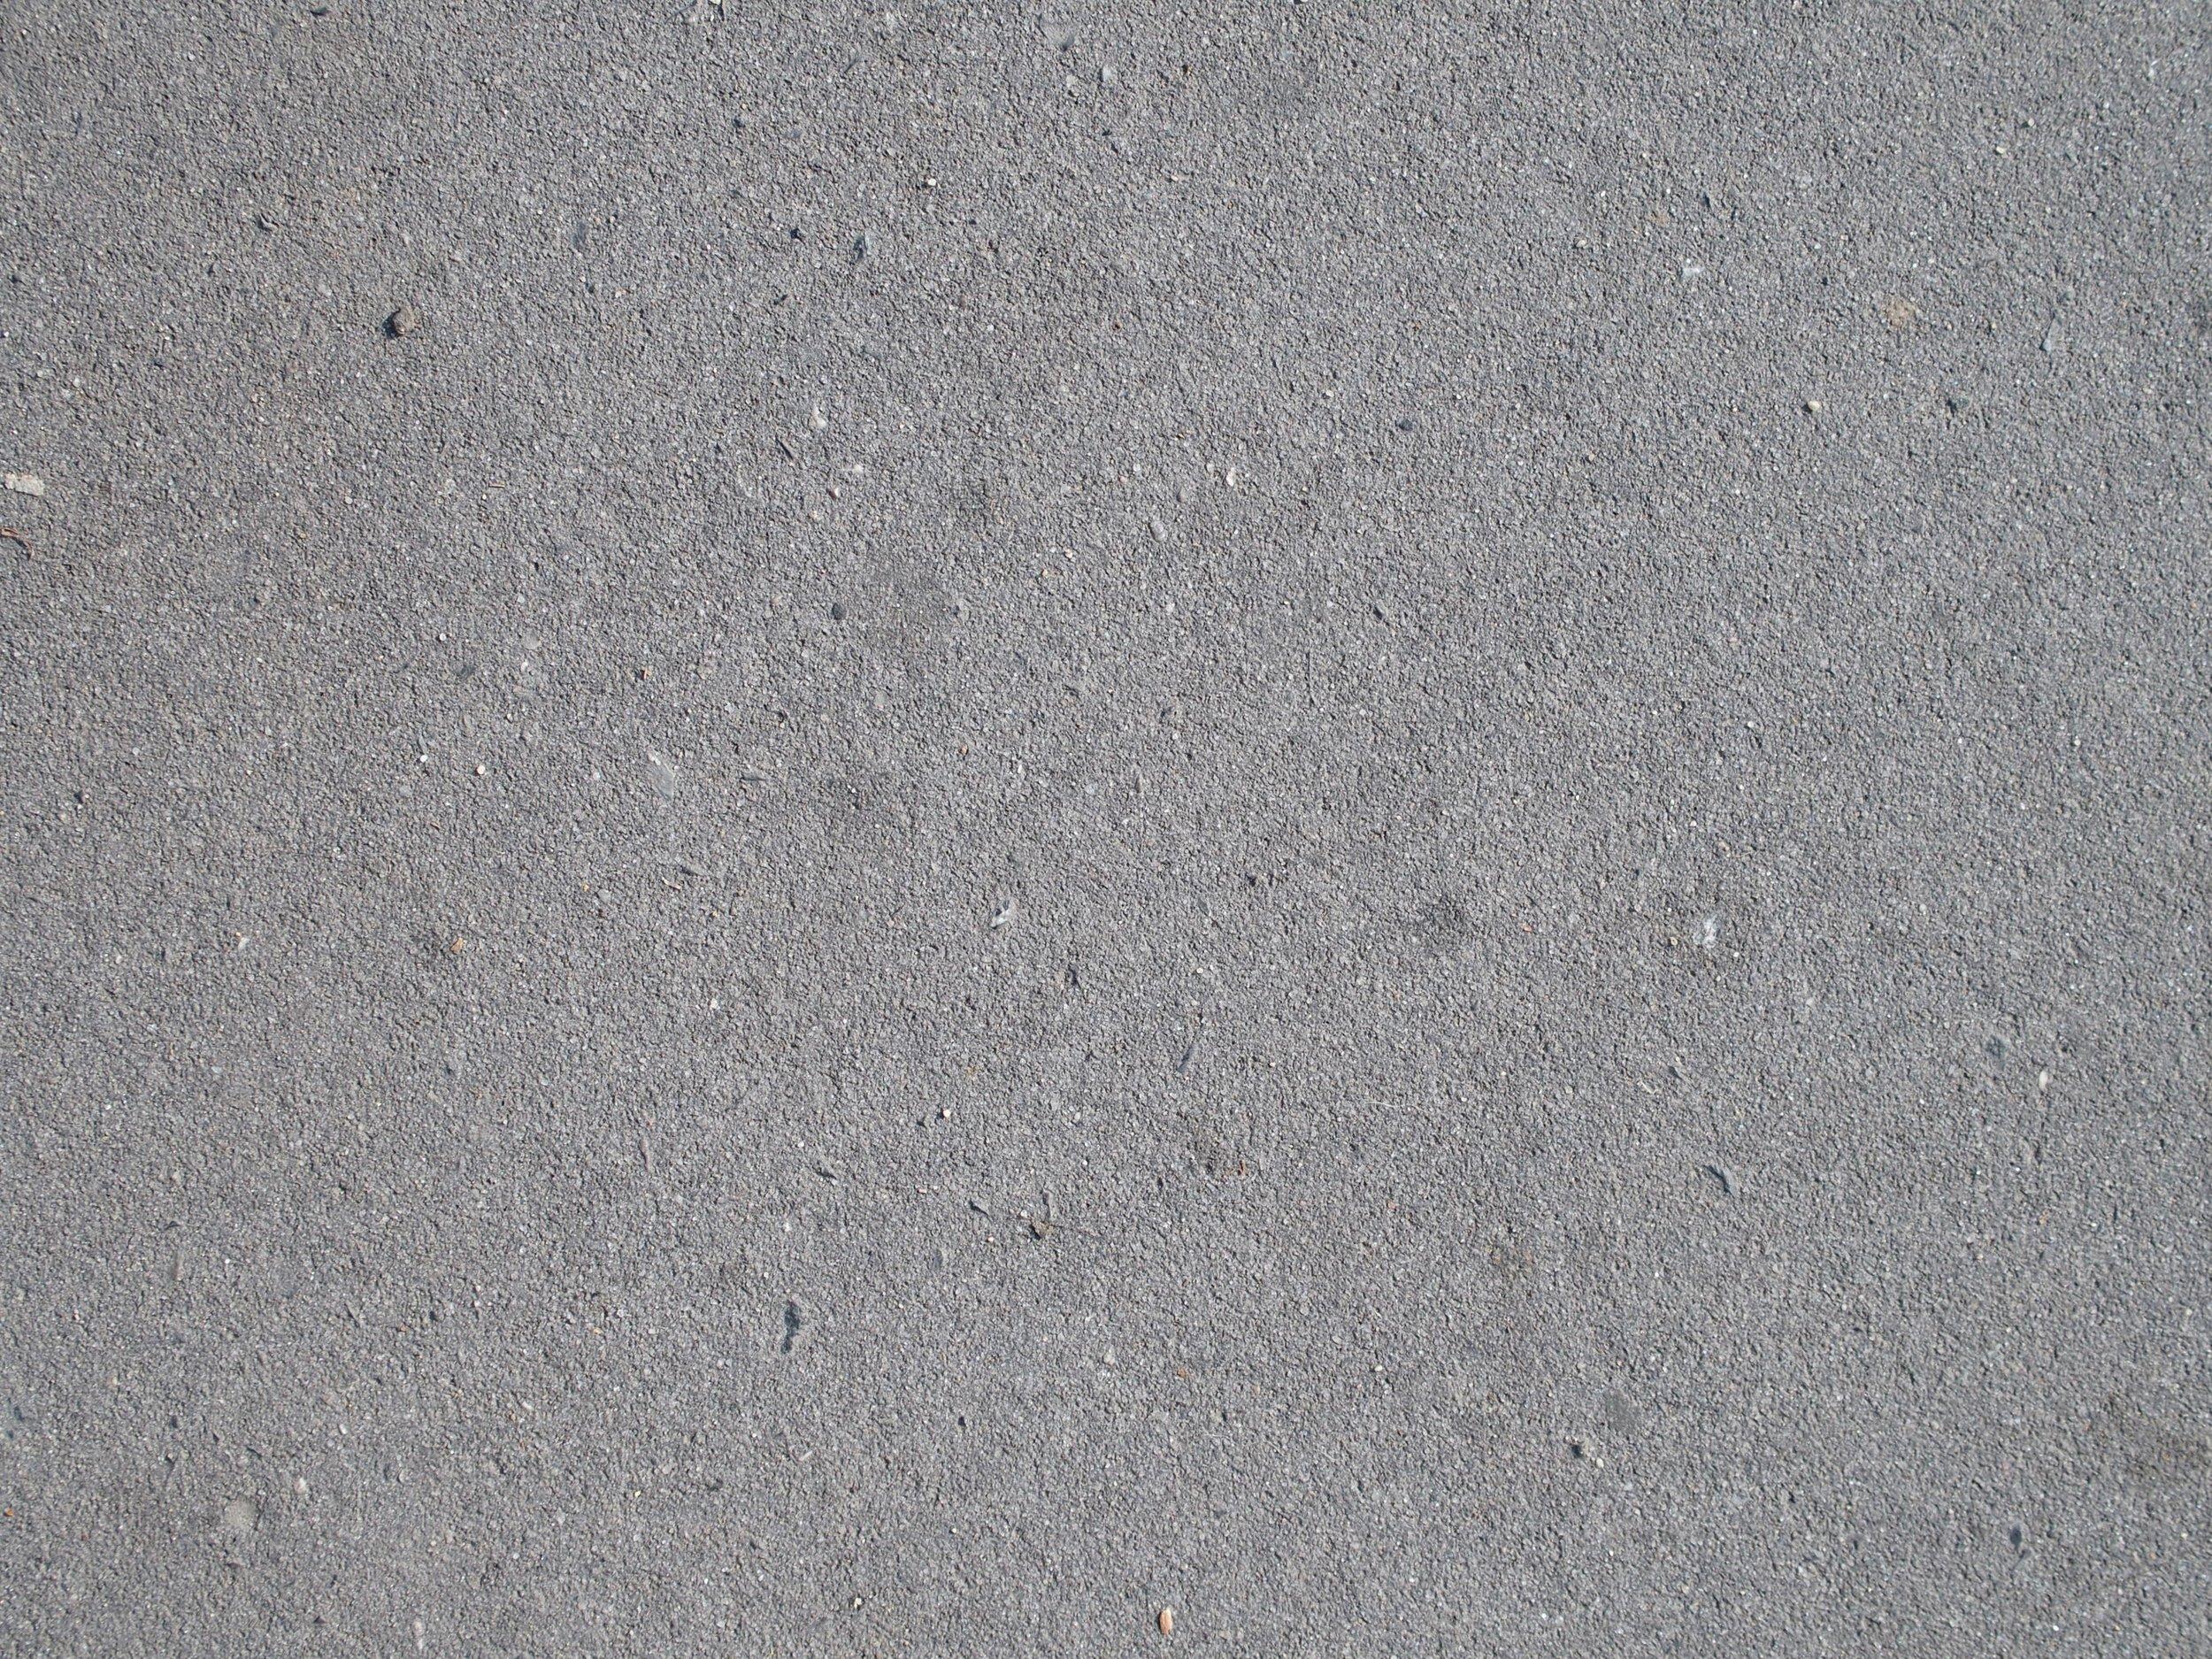 Concrete - Misku.jpg